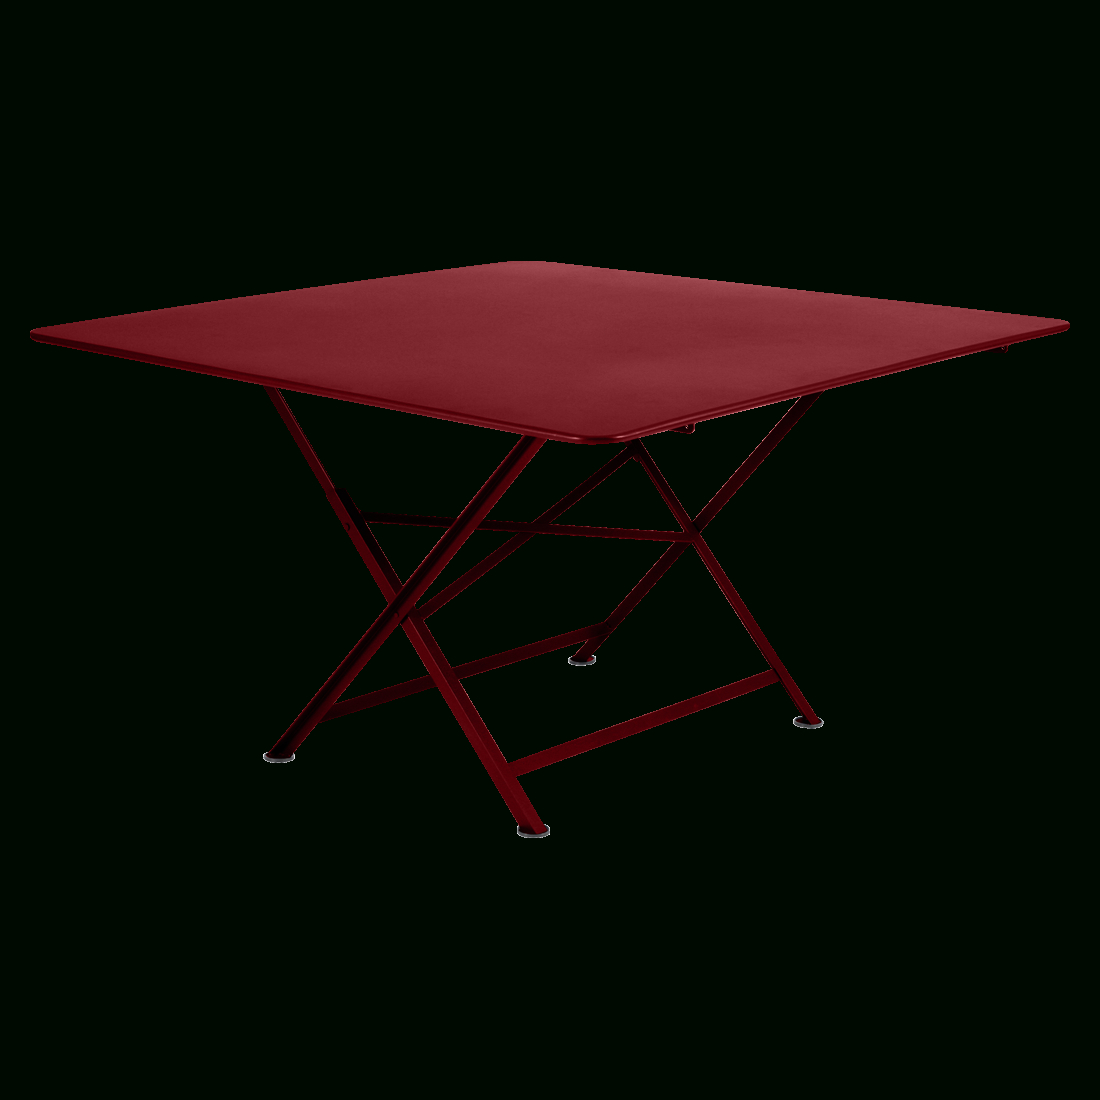 Cargo Table, Garden Table For 8, Outdoor Furniture intérieur Table De Jardin Metal Pliante